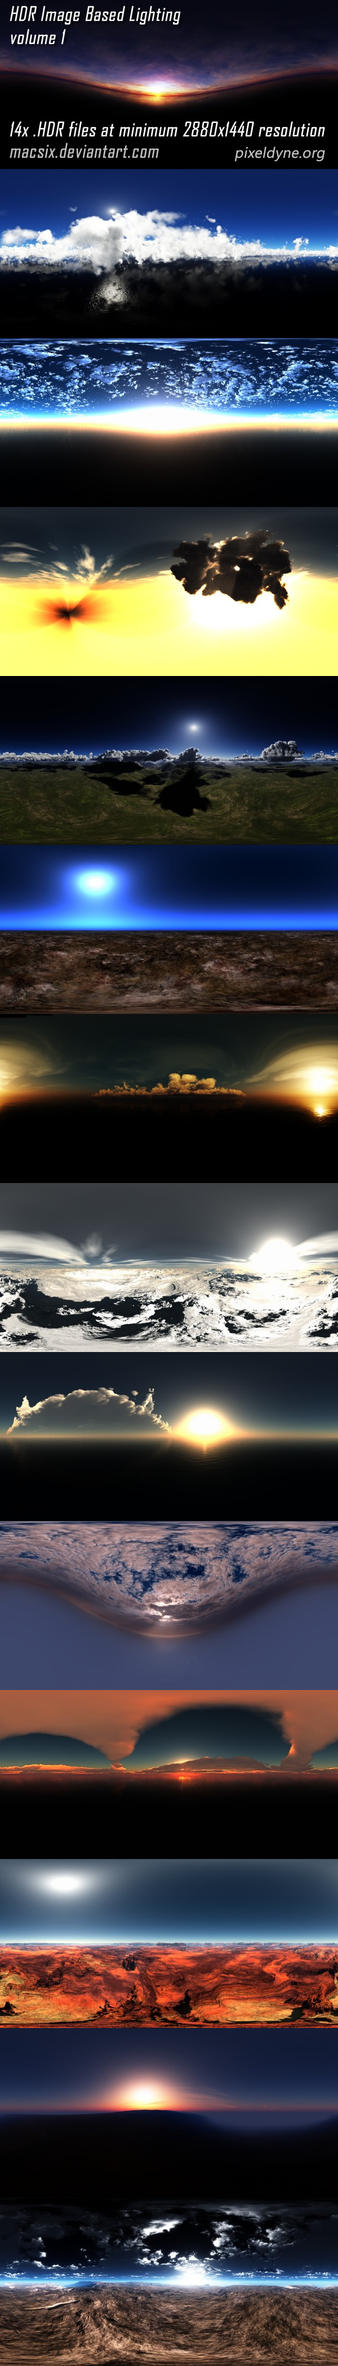 HDR IBL 360 panoramas Volume 1 by macsix